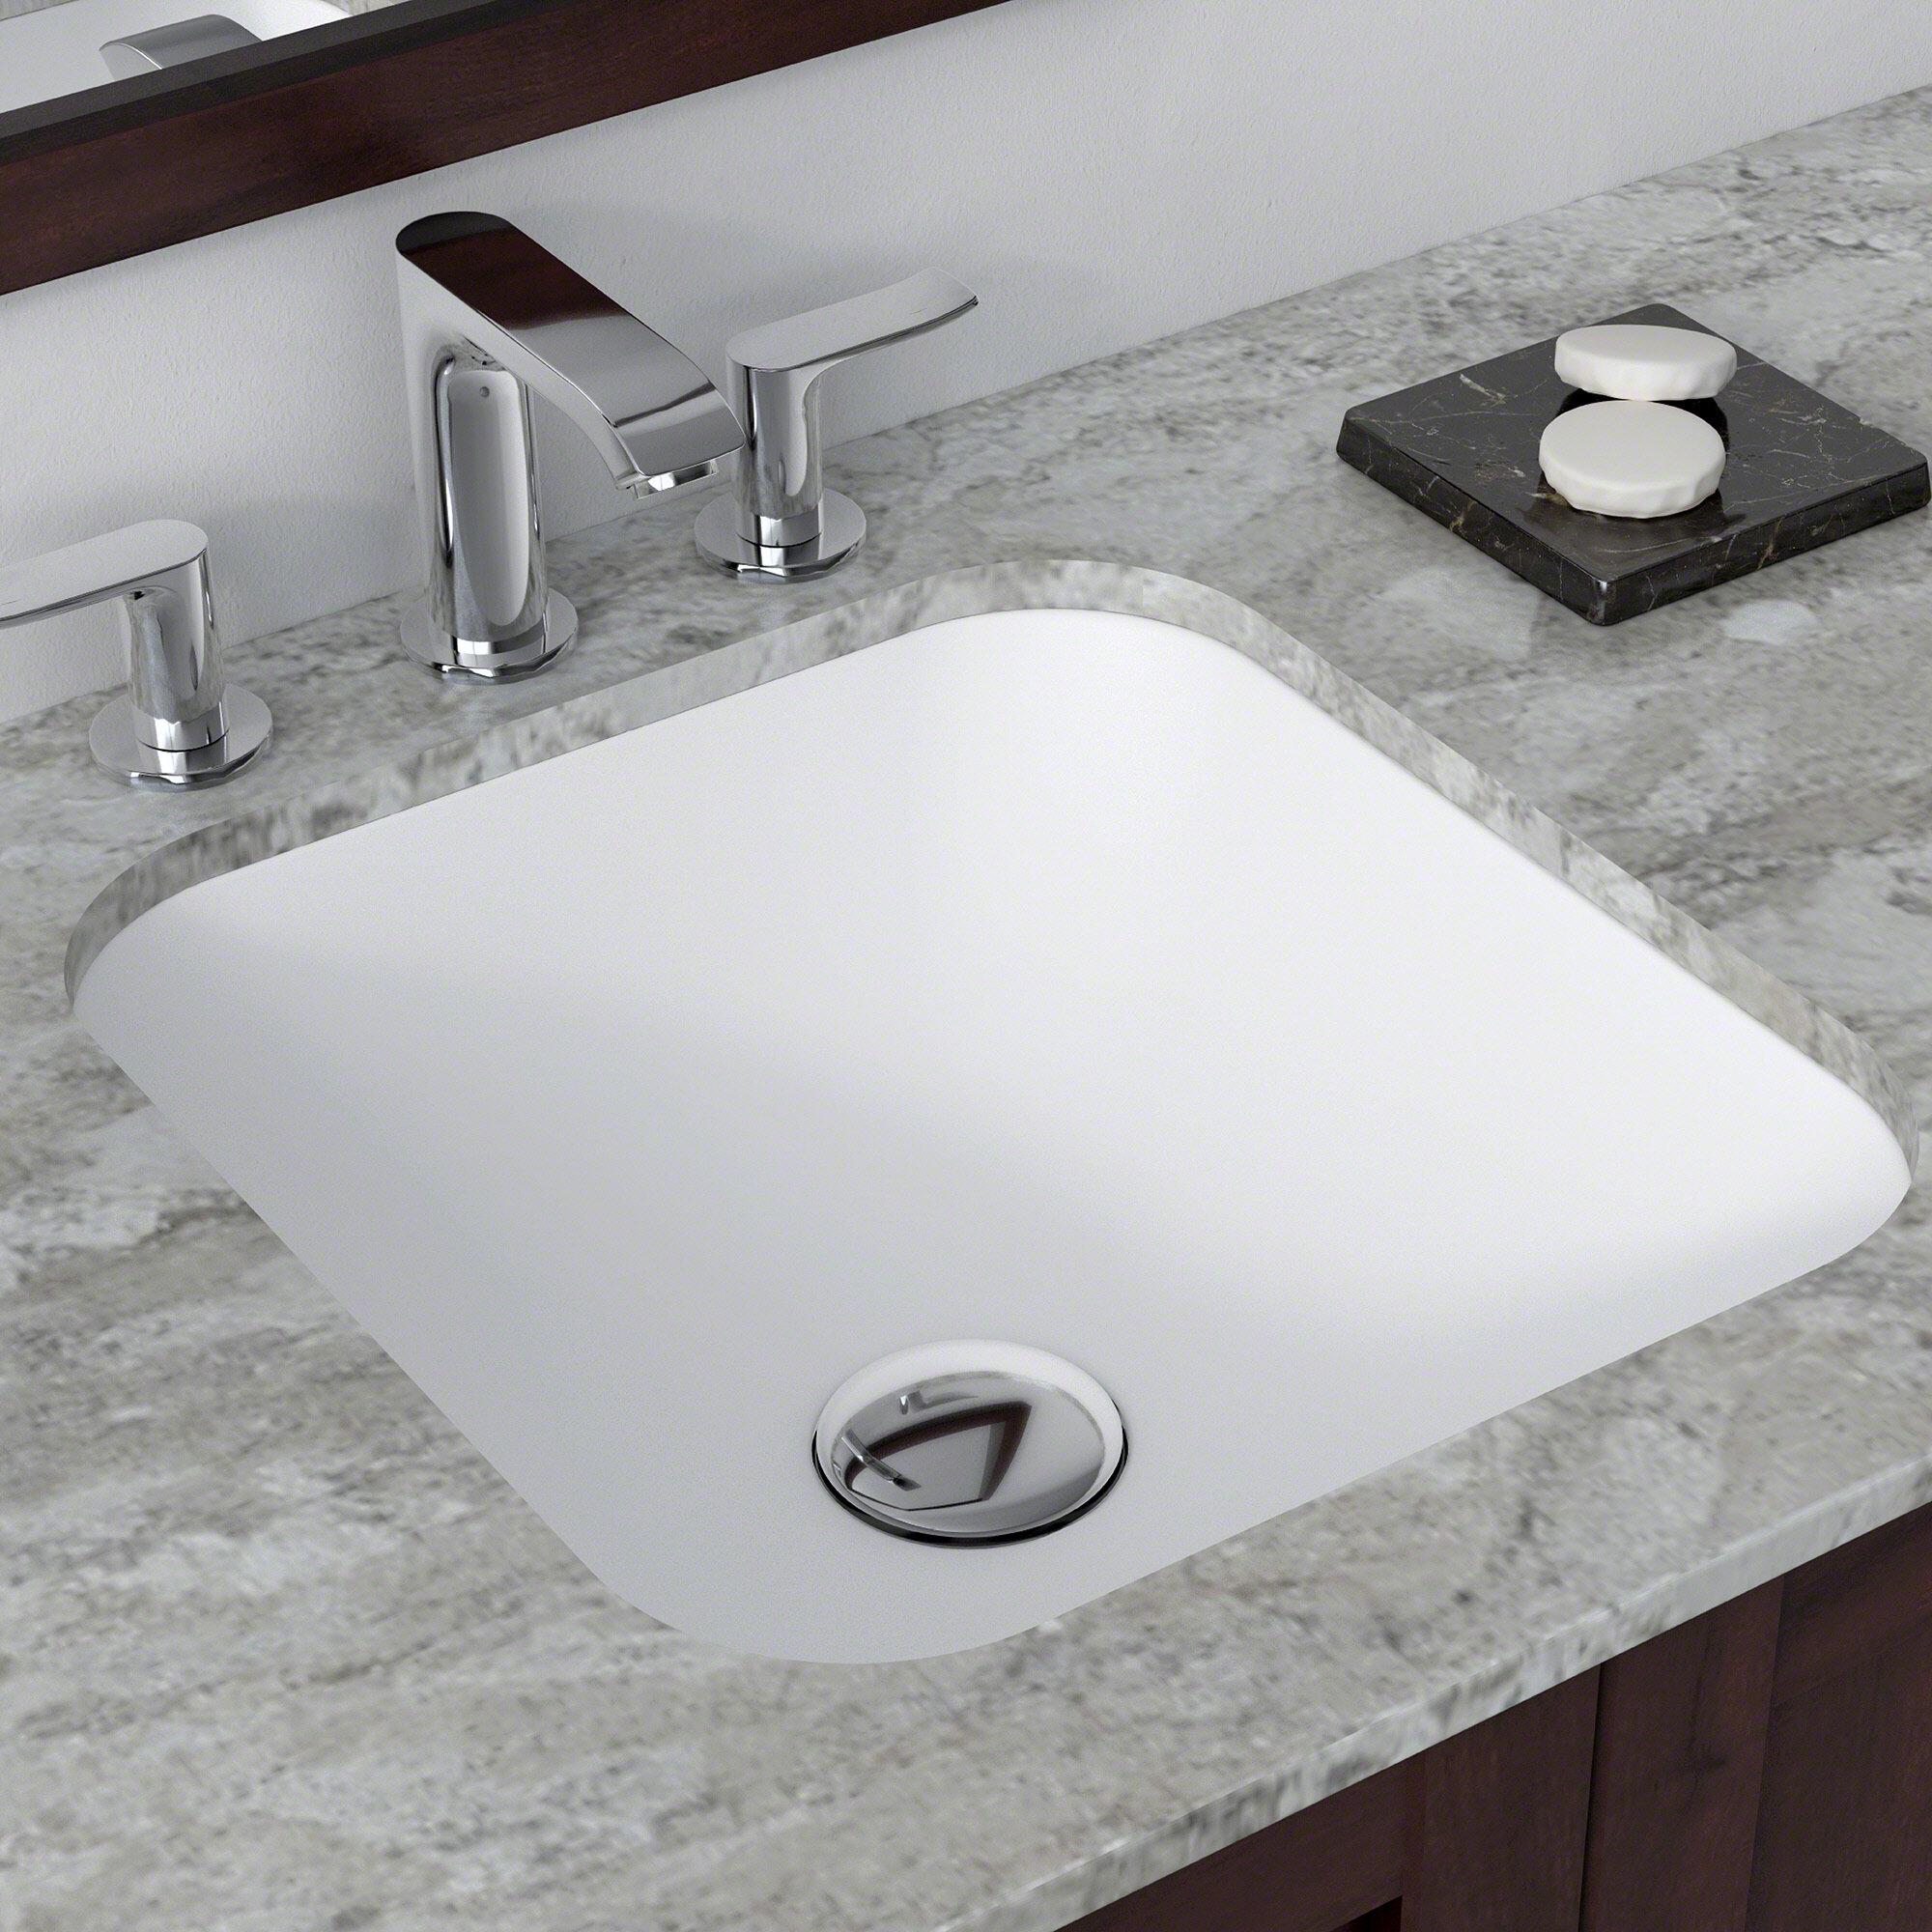 Kraus Natura Square Undermount Bathroom Sink Reviews Wayfair